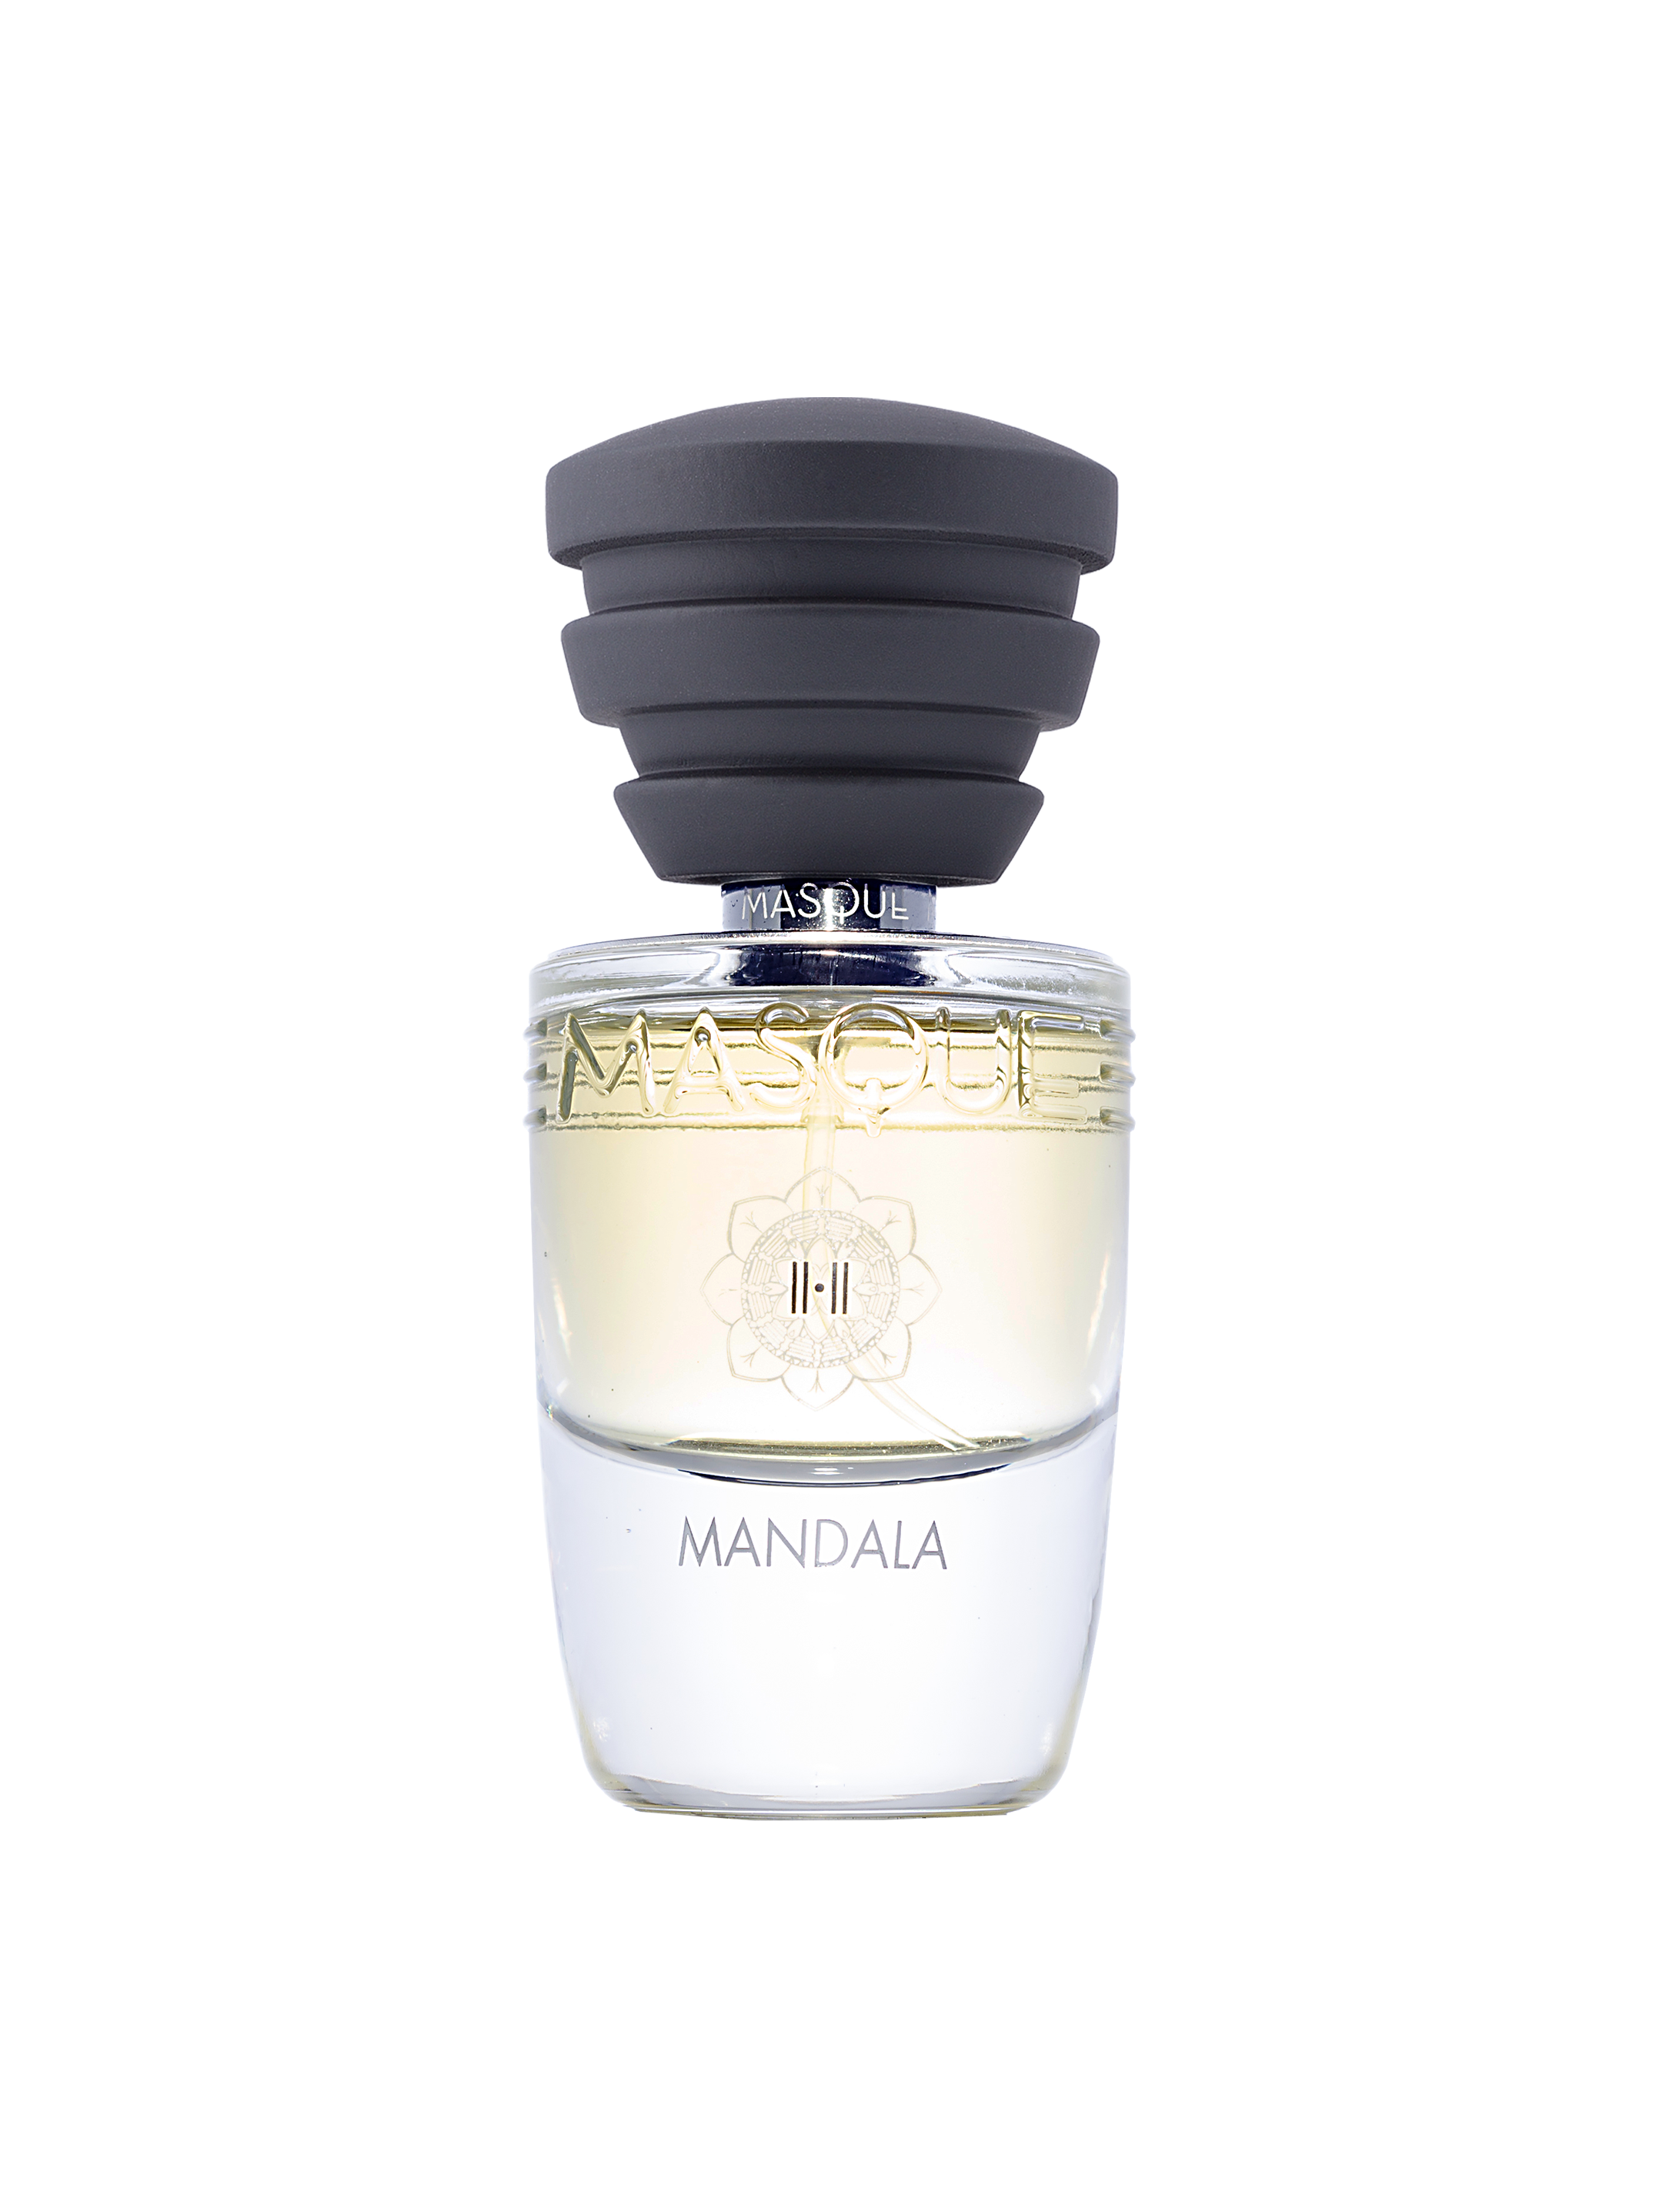 II.II Mandala - esoteric incense